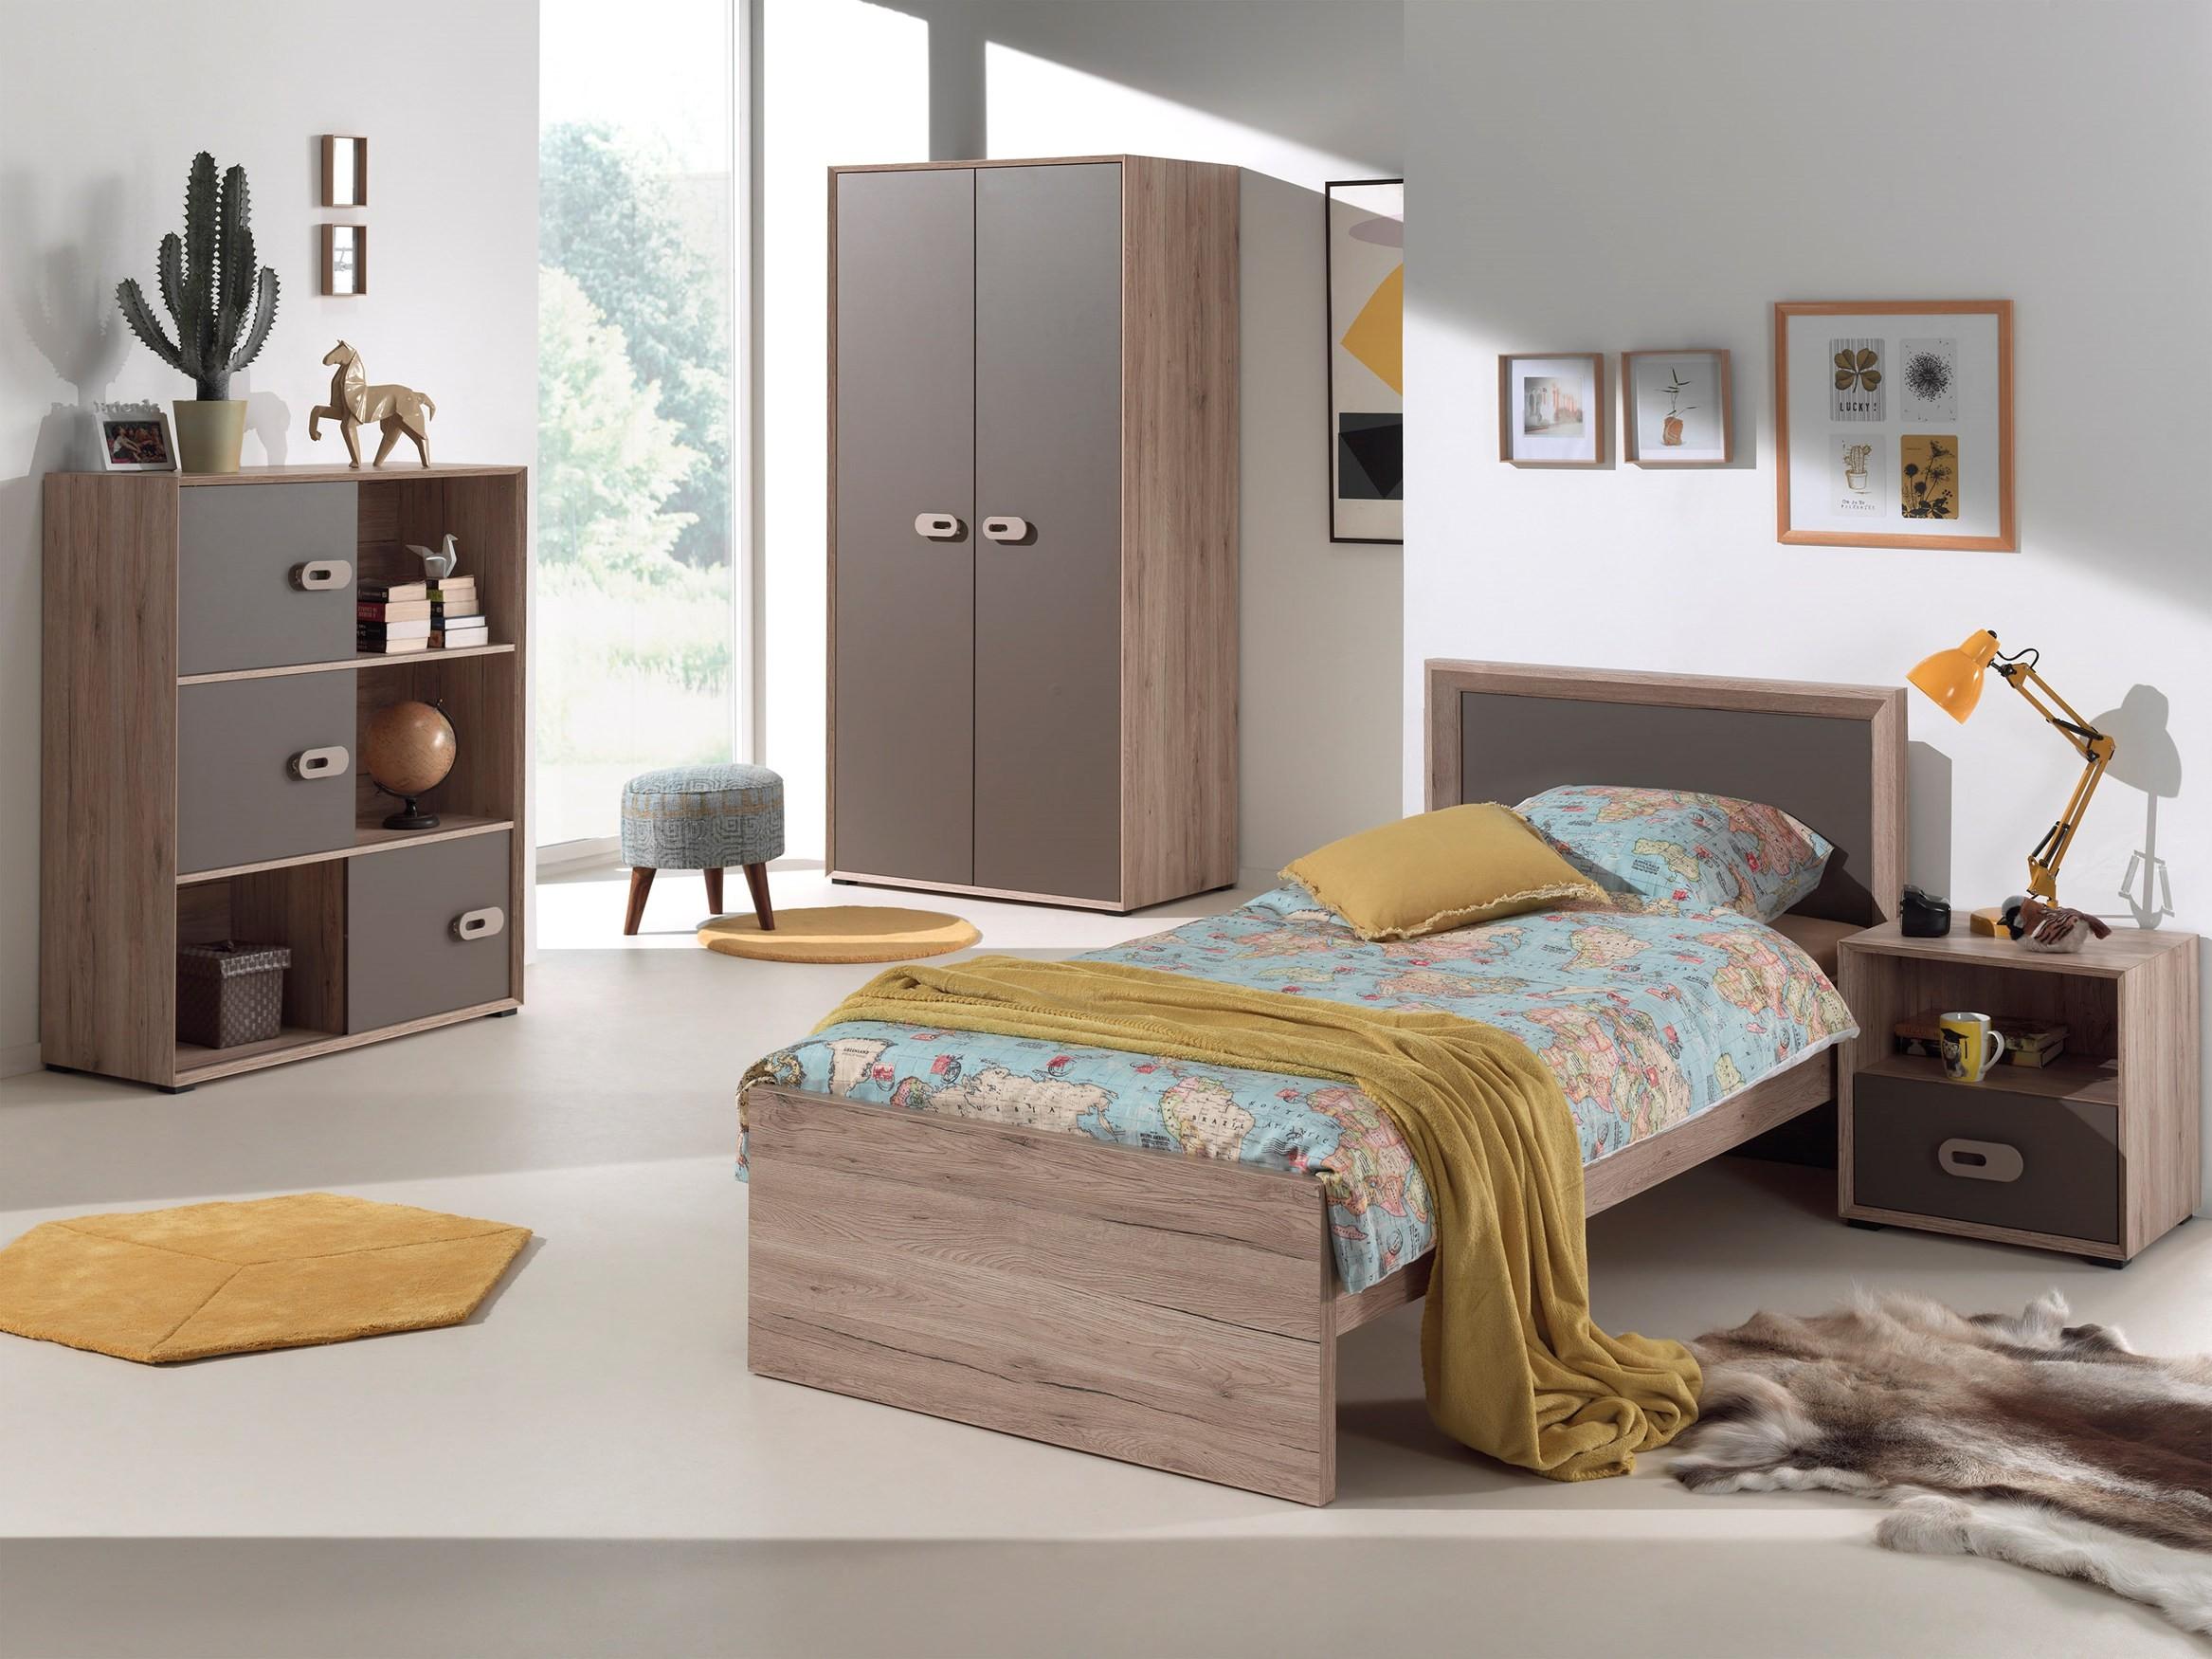 jugendzimmer emma 4 teilig mit raumteiler regal kinder jugendzimmer jugendzimmer sets. Black Bedroom Furniture Sets. Home Design Ideas